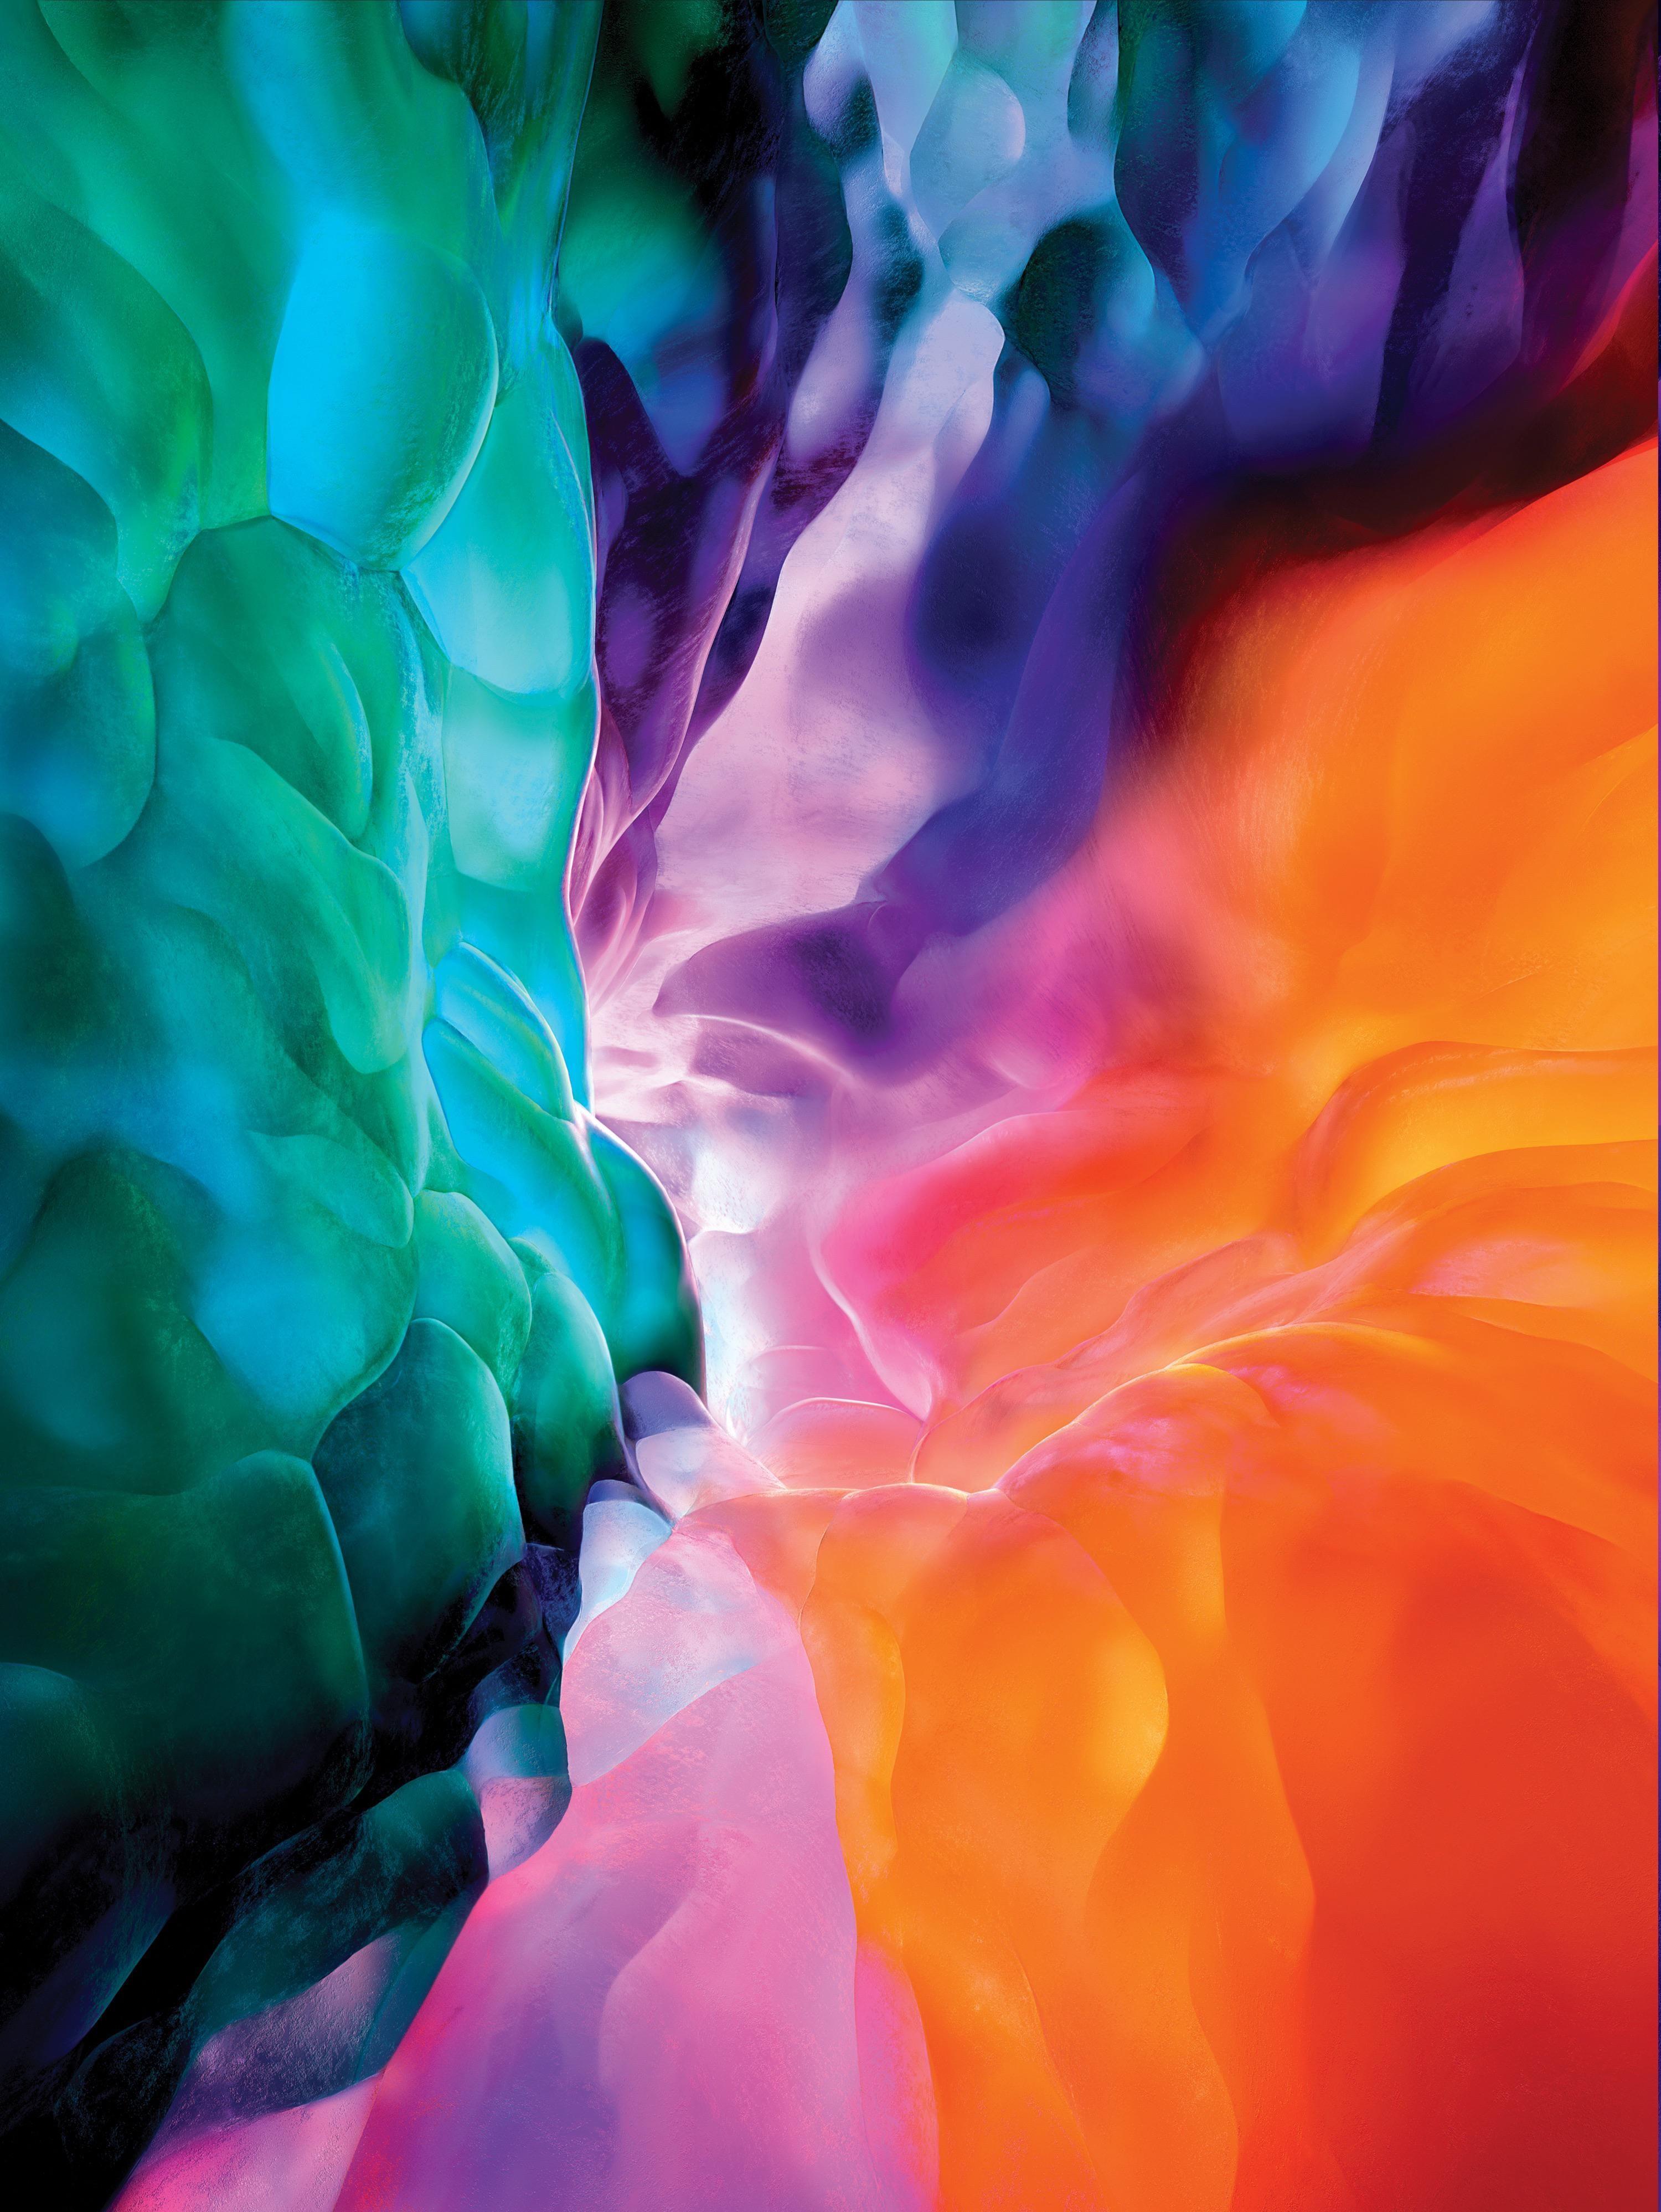 New Ipad Pro 2020 Wallpaper Wallpaper Ipad Seni Huruf Abstrak